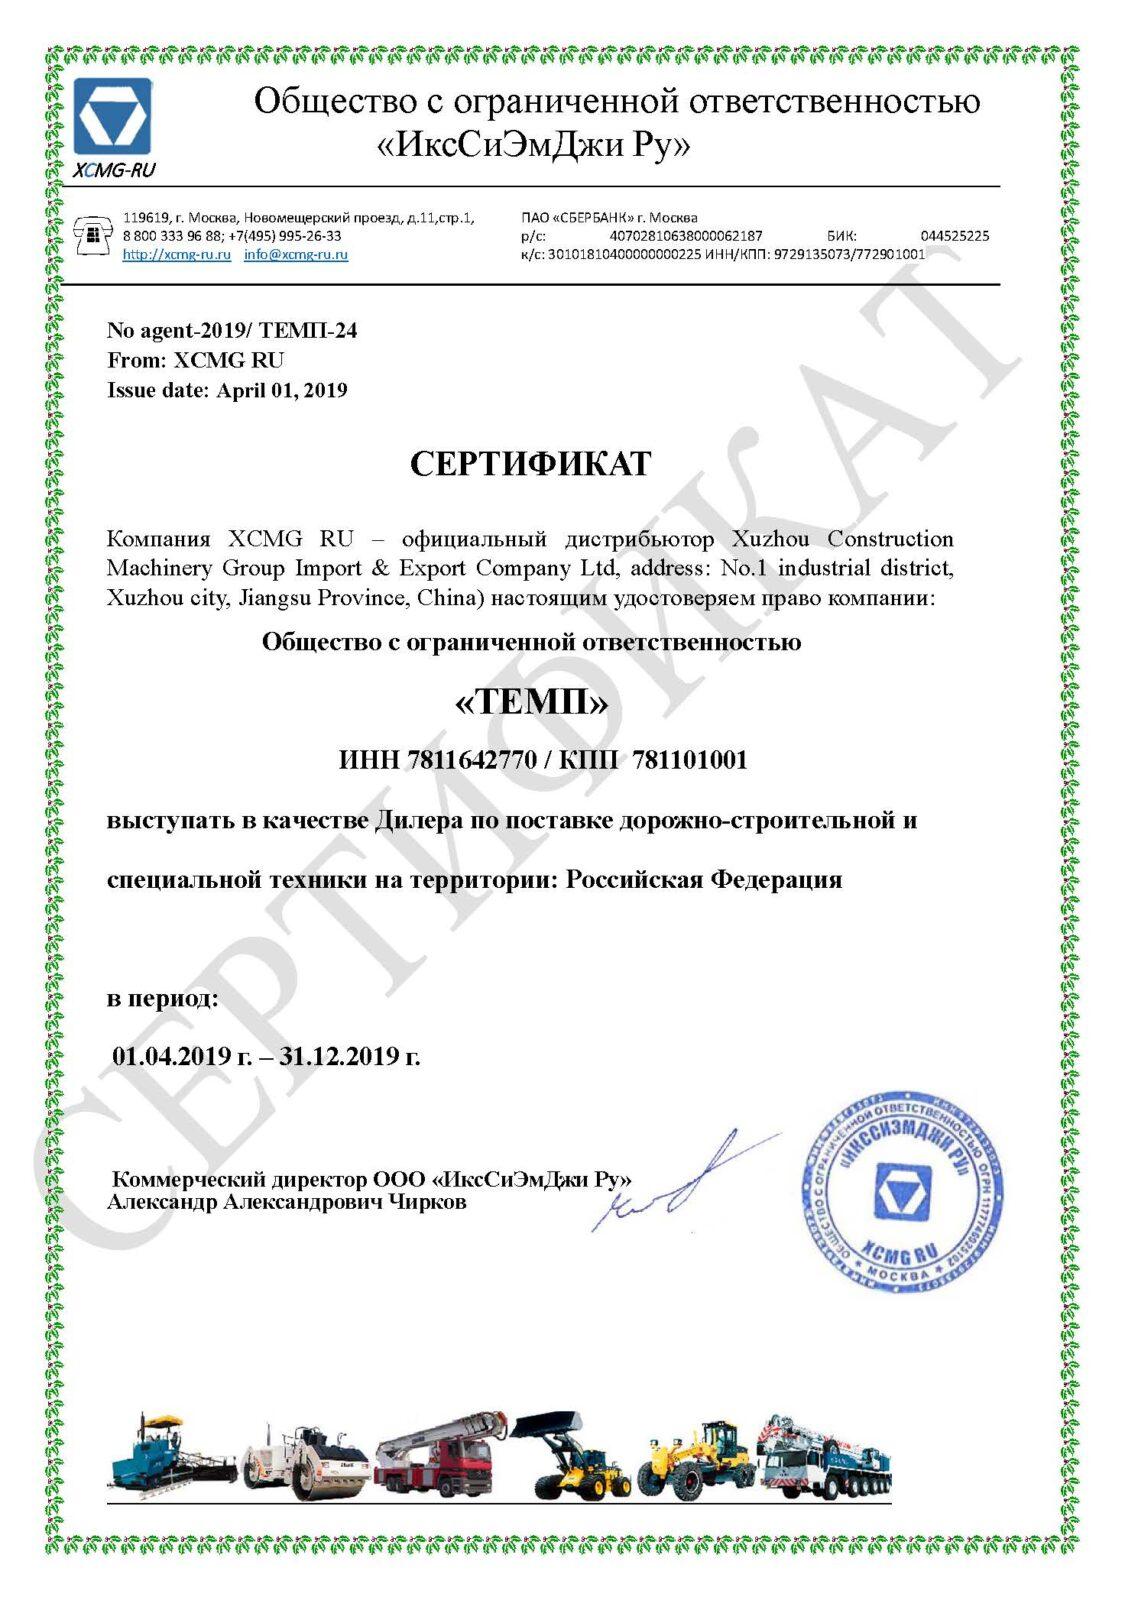 Дилерский сертификат XCMG (Темп)